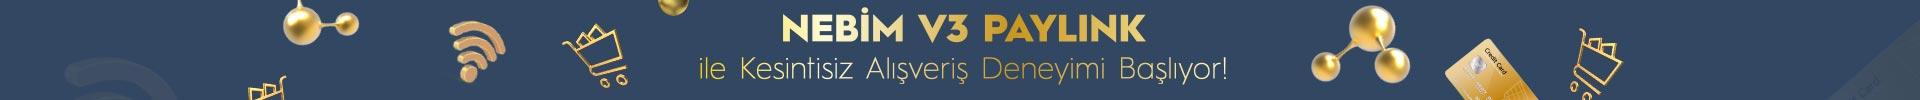 Nebim V3 reklamı